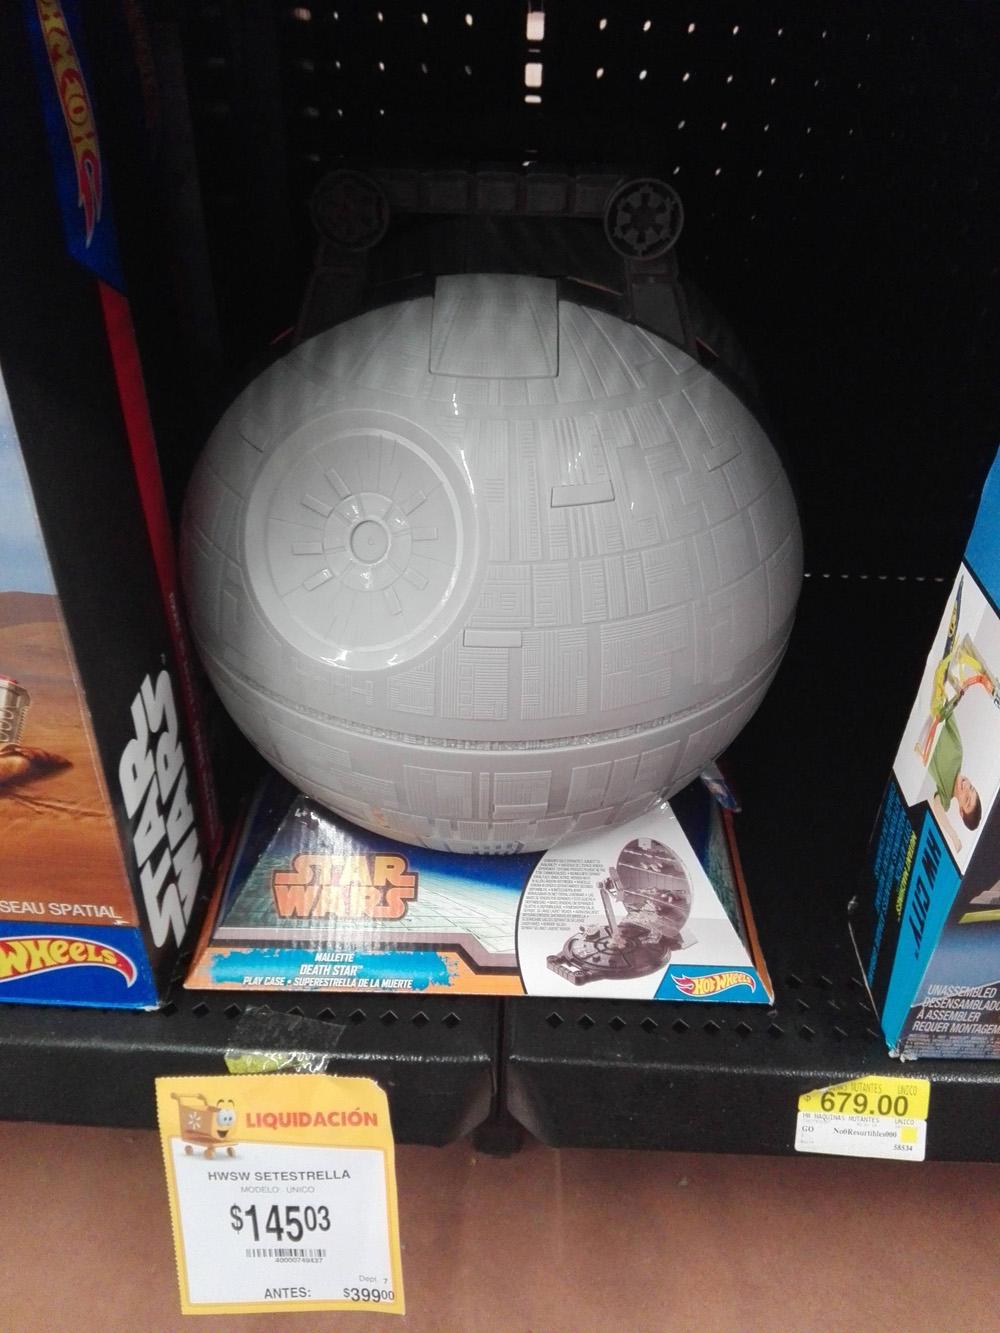 Walmart: estrella de la muerte Hotwheels a $149.03 (online a $225)